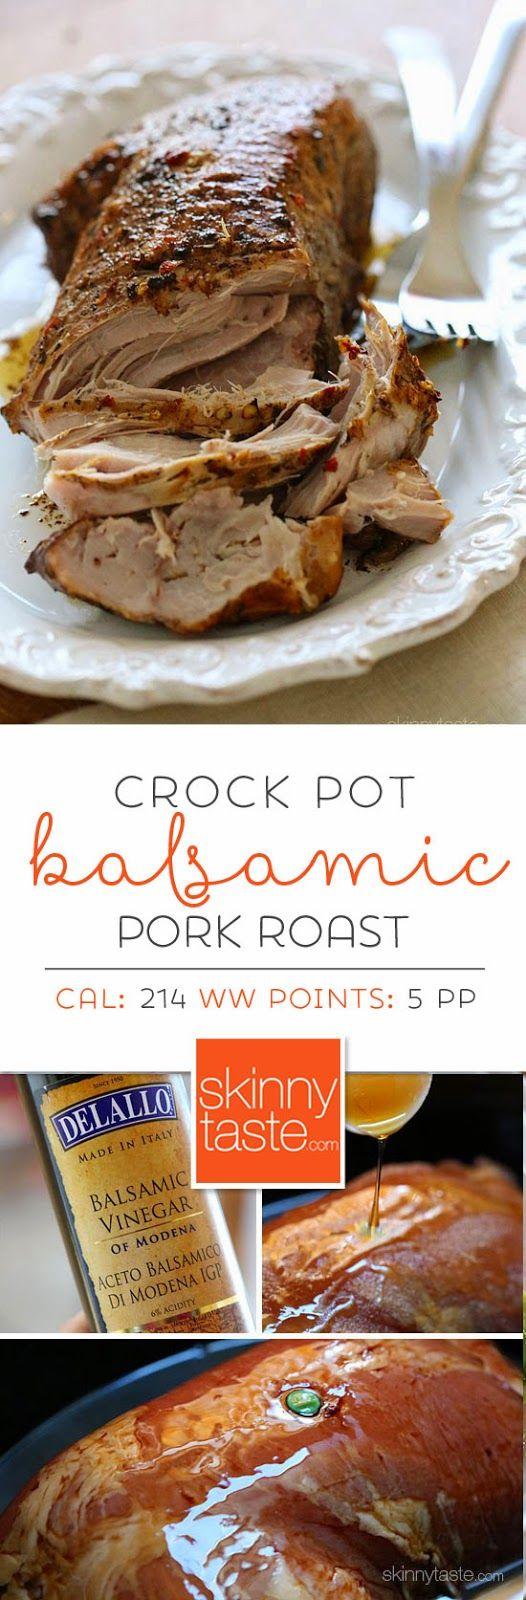 Crock Pot Balsamic Pork Roast